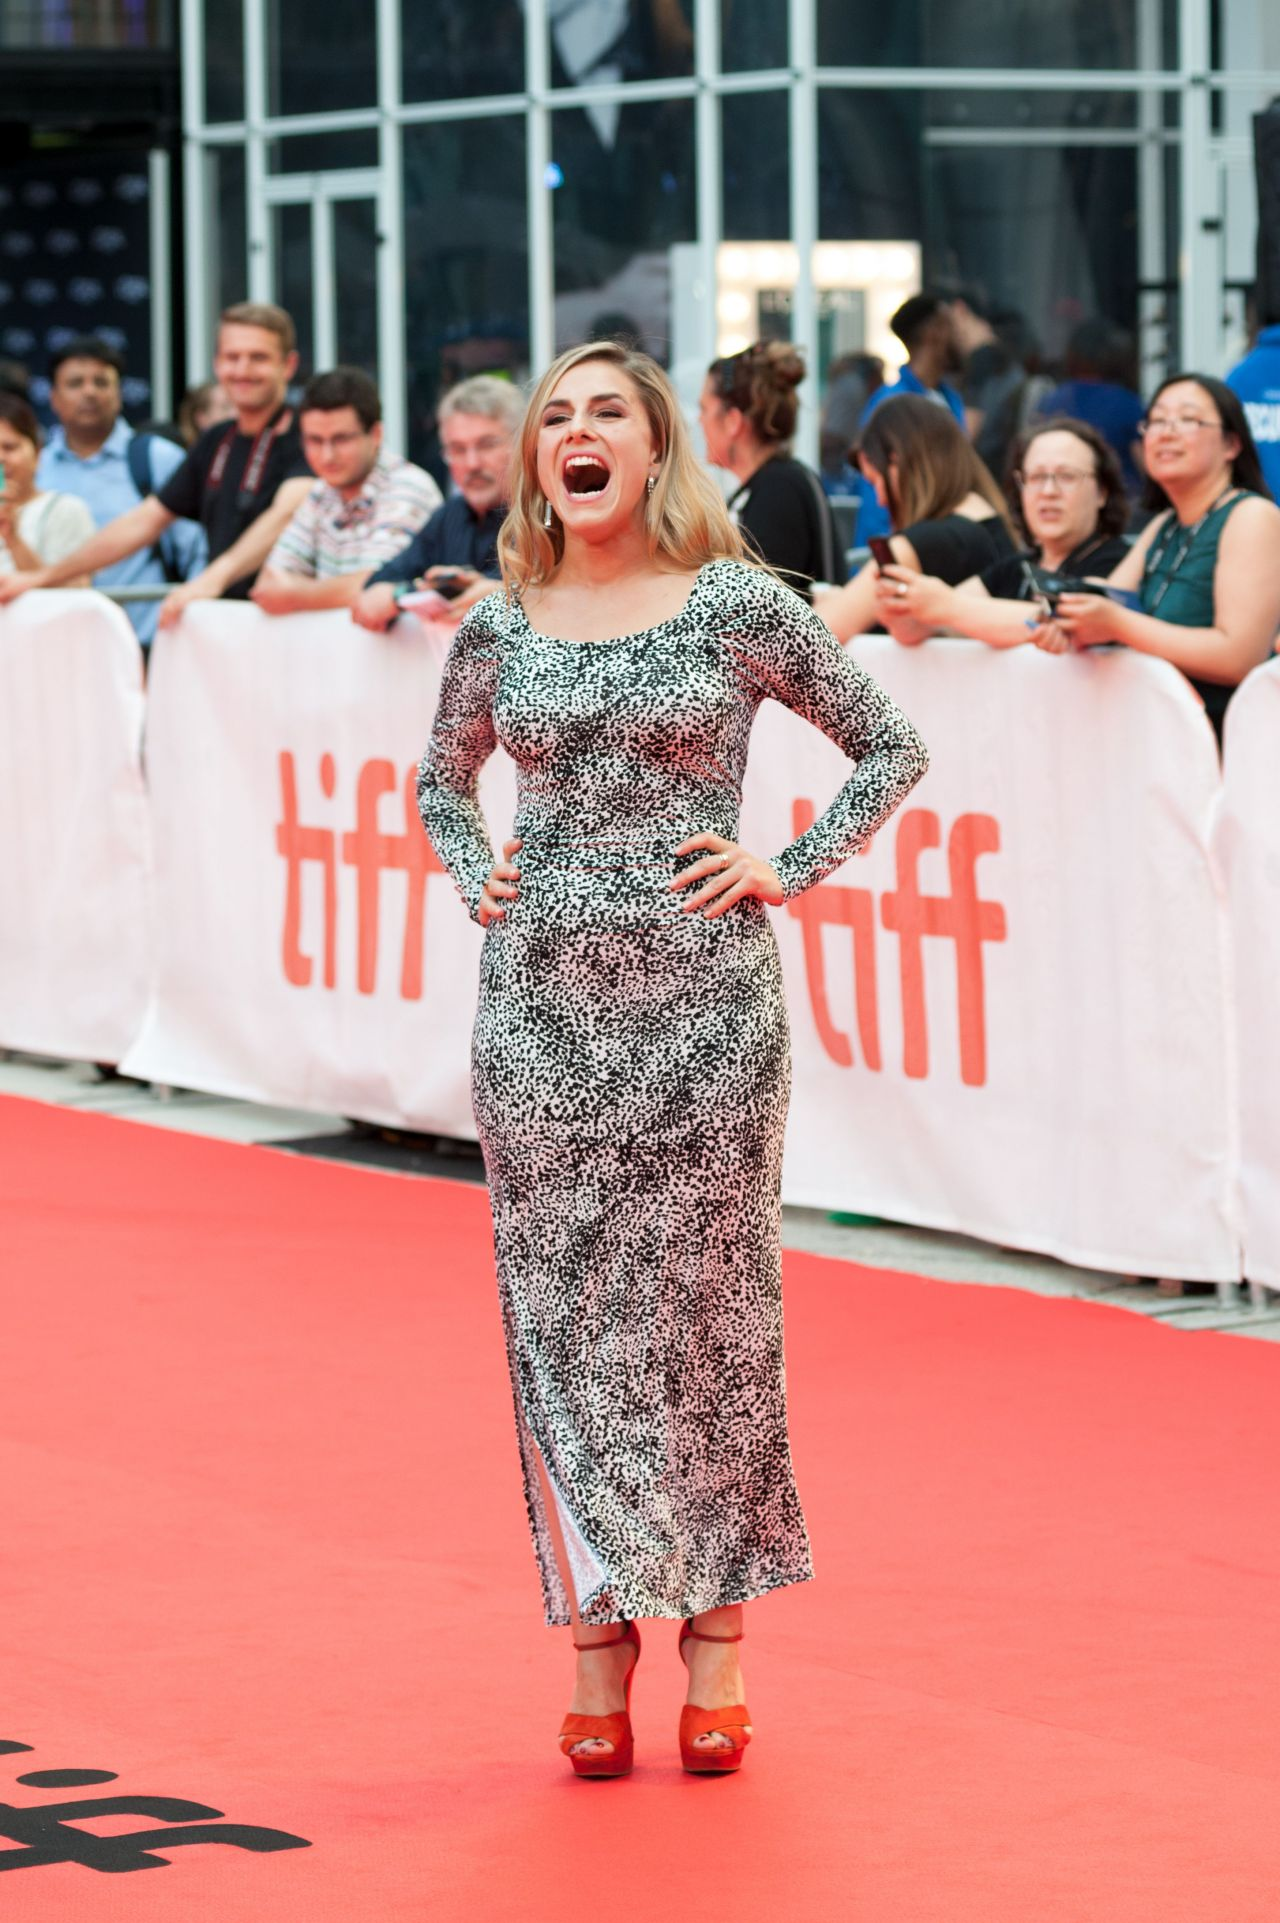 Alix Wilton Regan The Wife Premiere In Toronto 09 14 2017